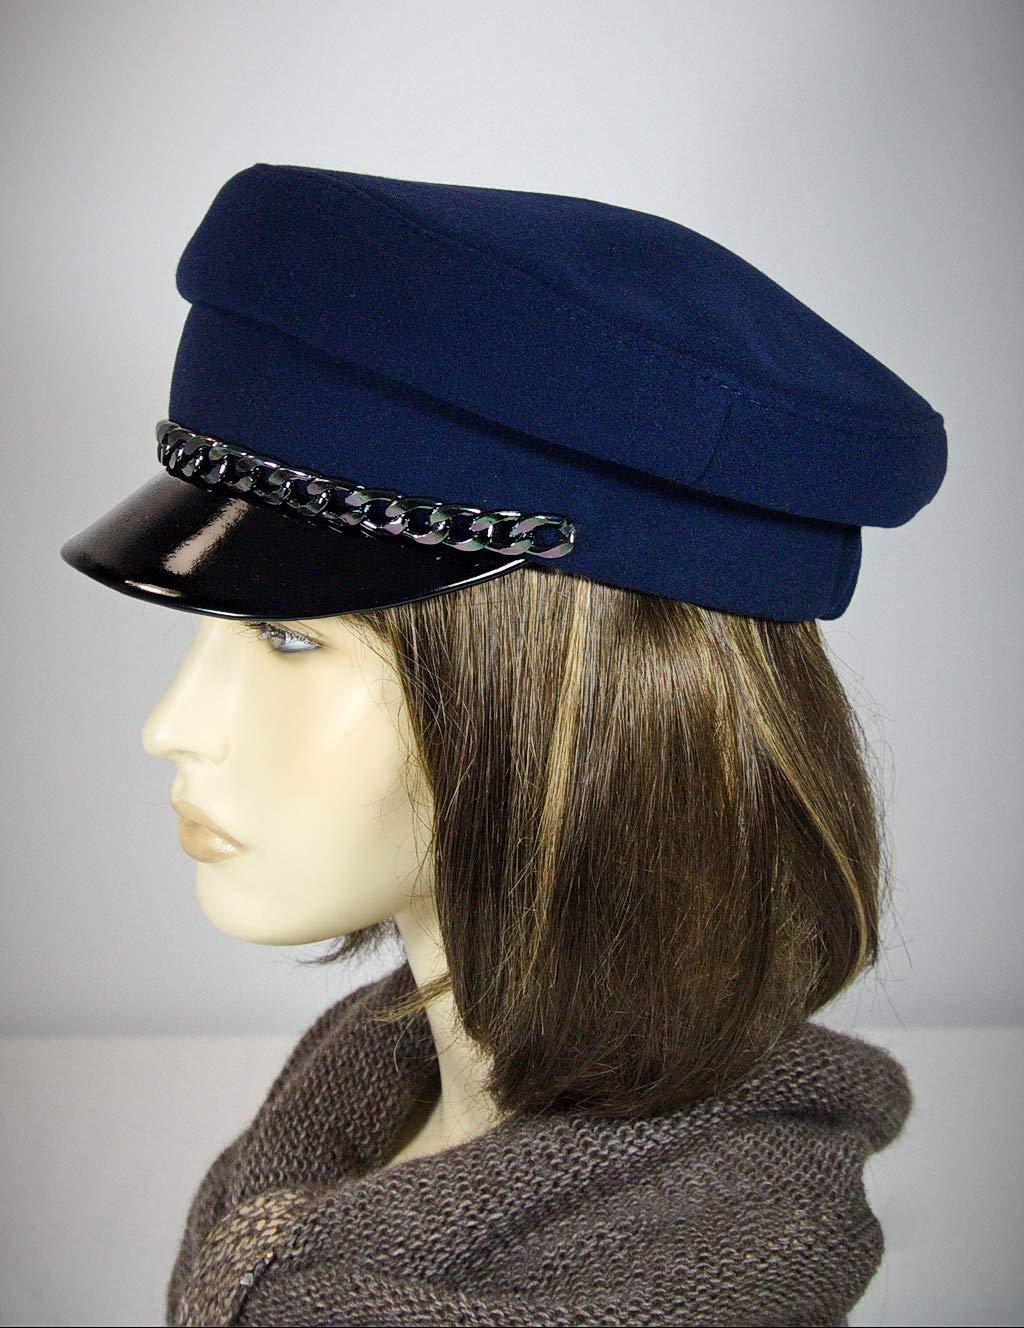 Breton hat, cap with strap, john lennon cap,baker boy cap, captains hat, breton style, baker cap, blue breton hat, cape breton hat.